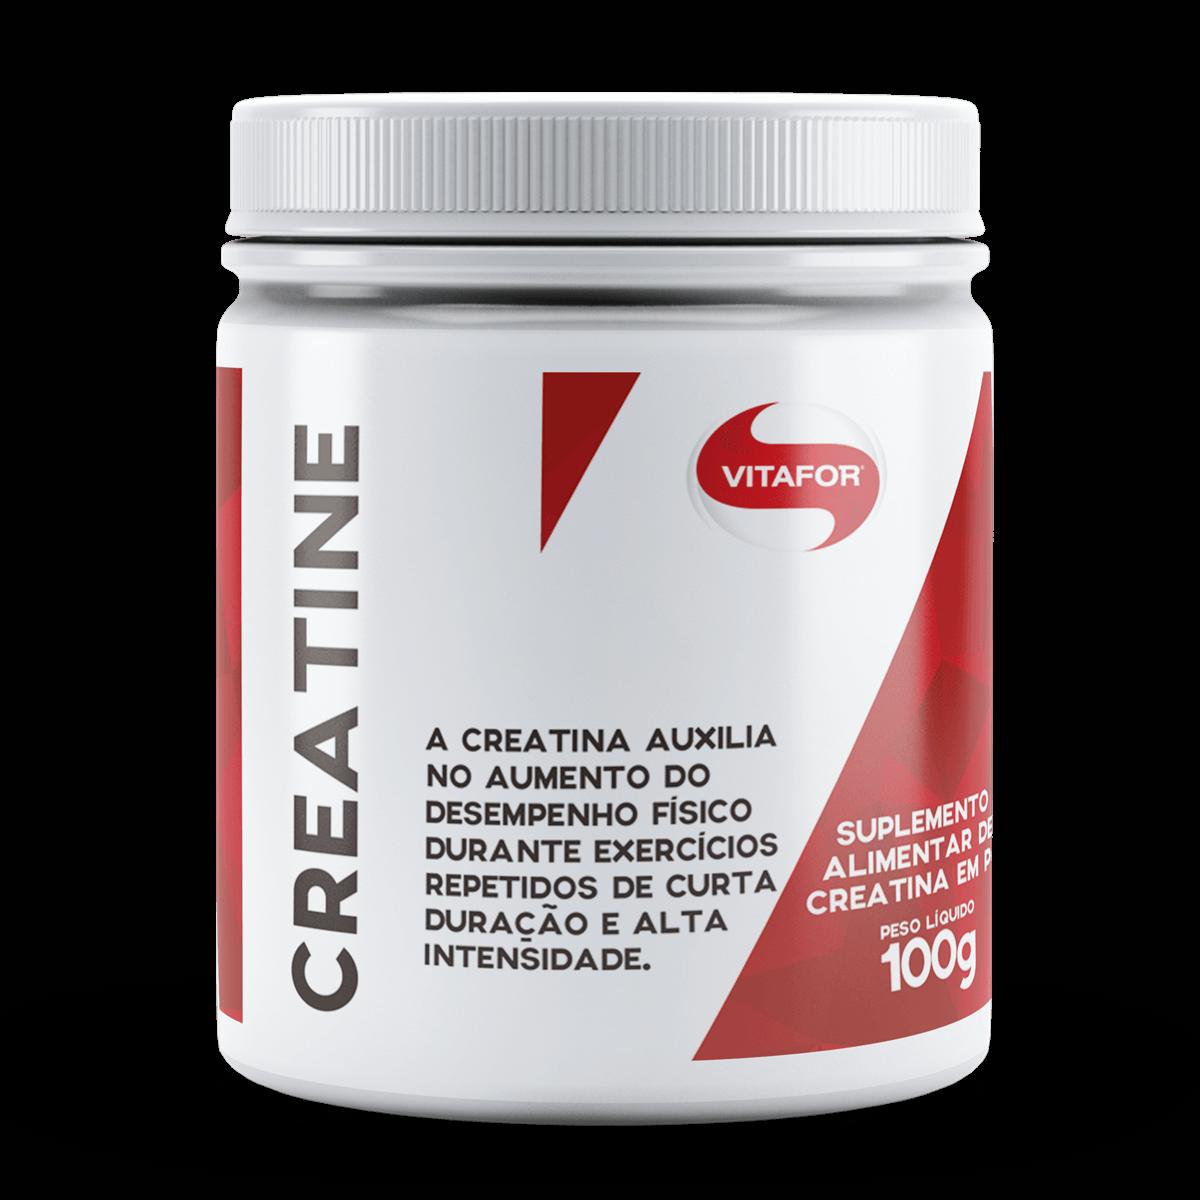 Creatine Creatina (100g) - VitaFor